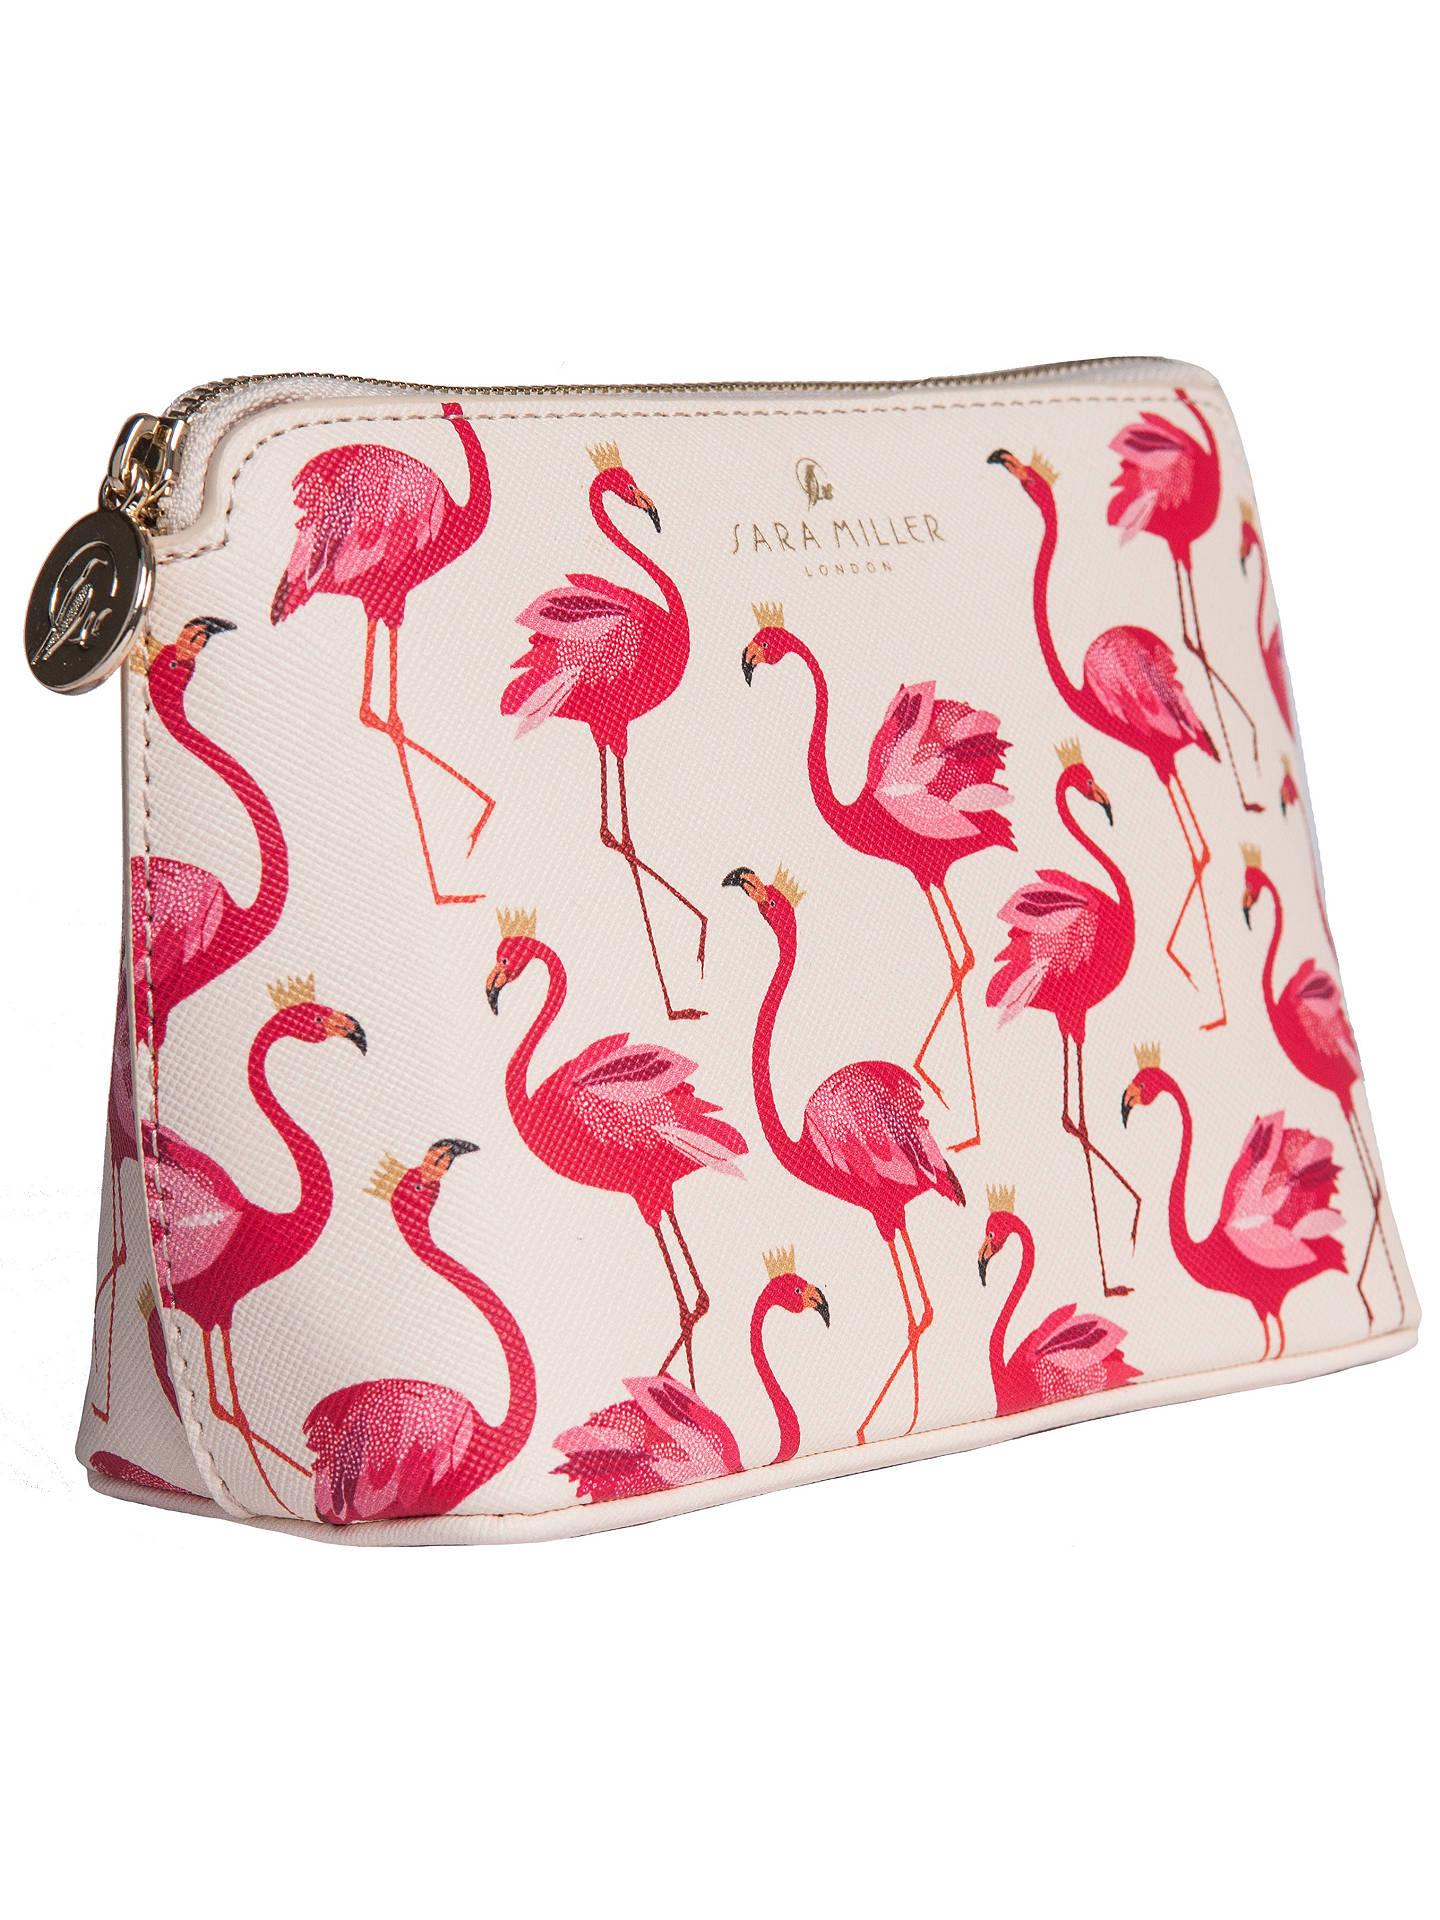 25d2cf3357a5 Sara Miller Flamingo Cosmetic Bag, Cream